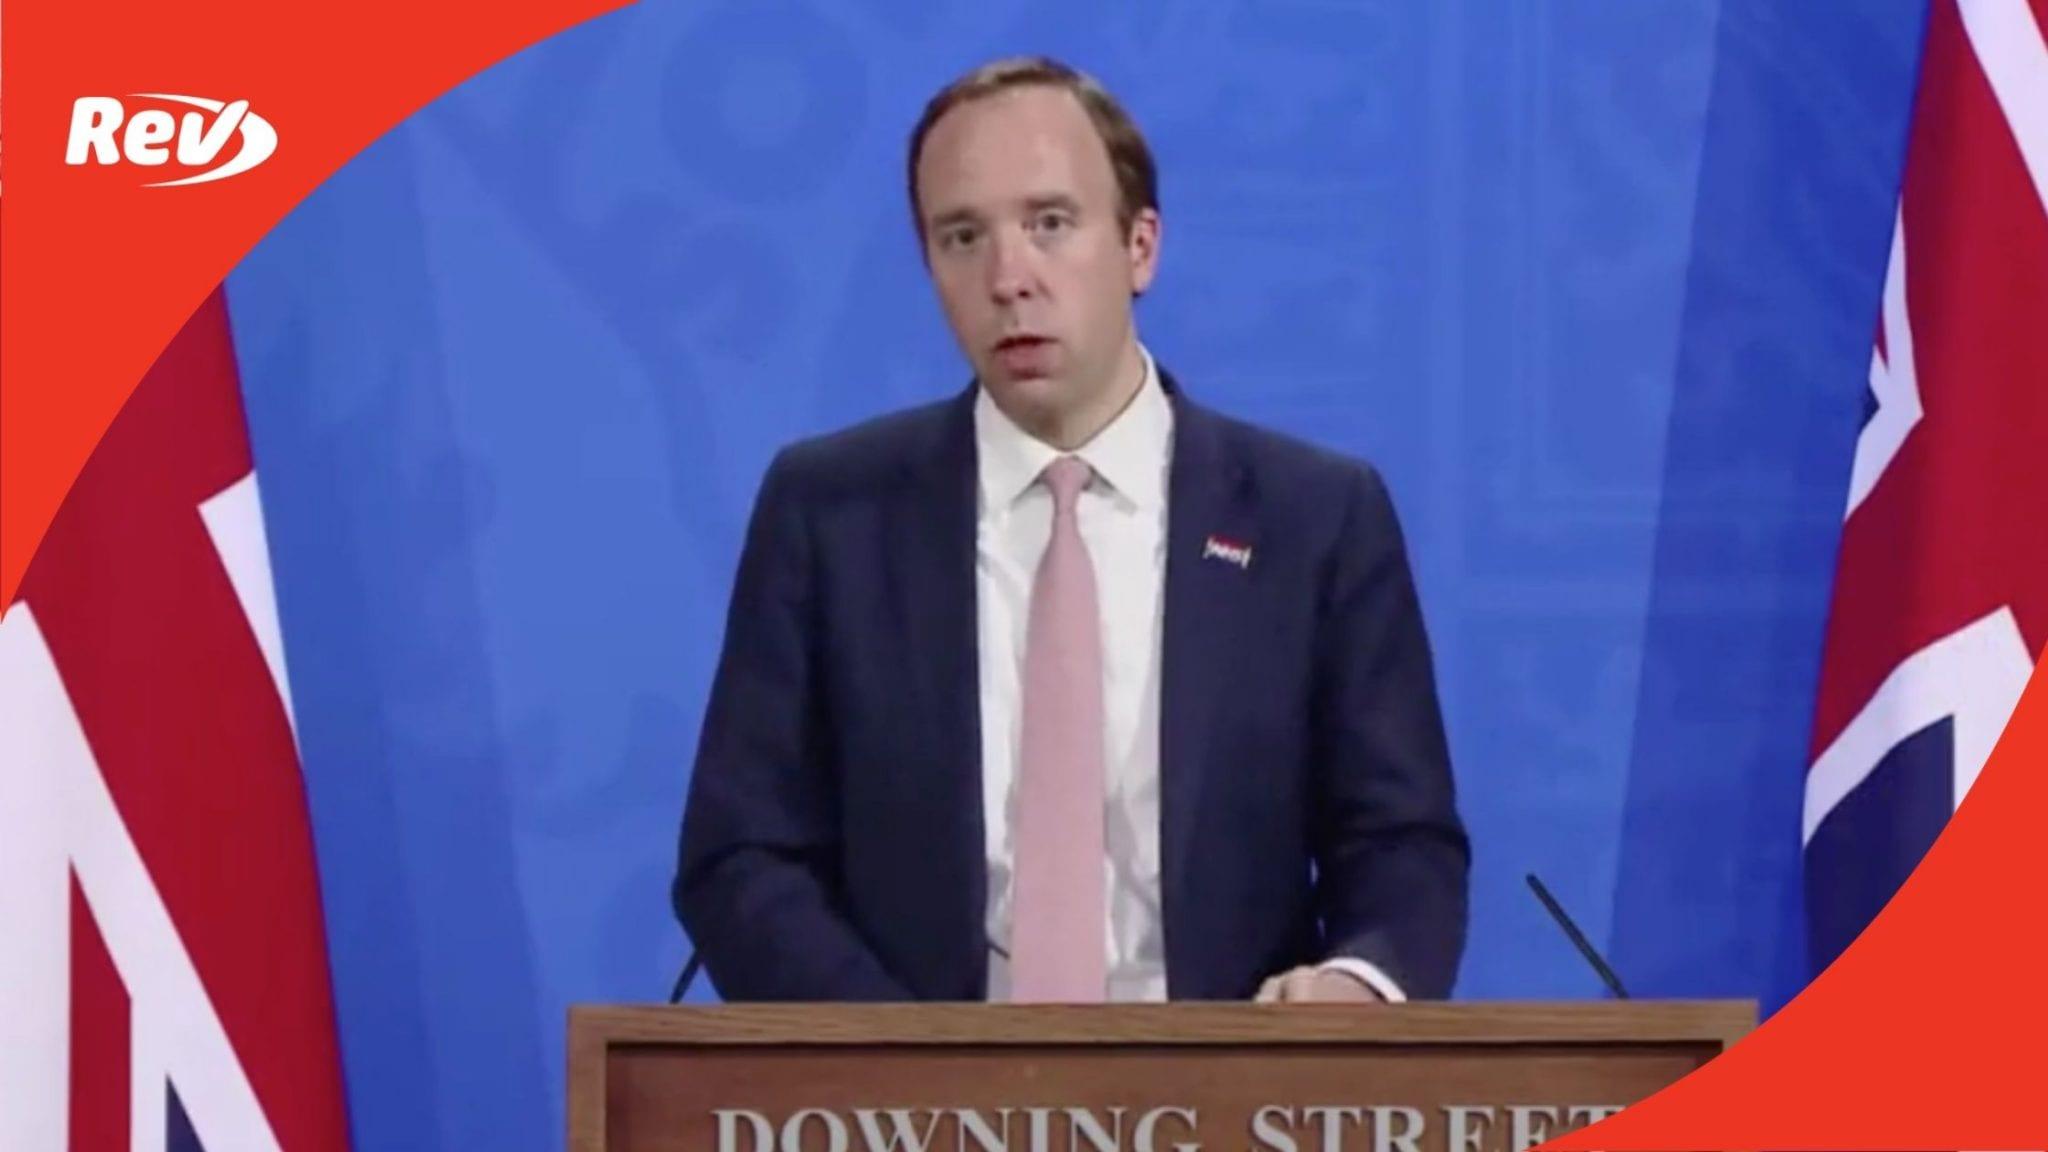 UK Downing Street Coronavirus Press Conference with Matt Hancock Transcript May 27